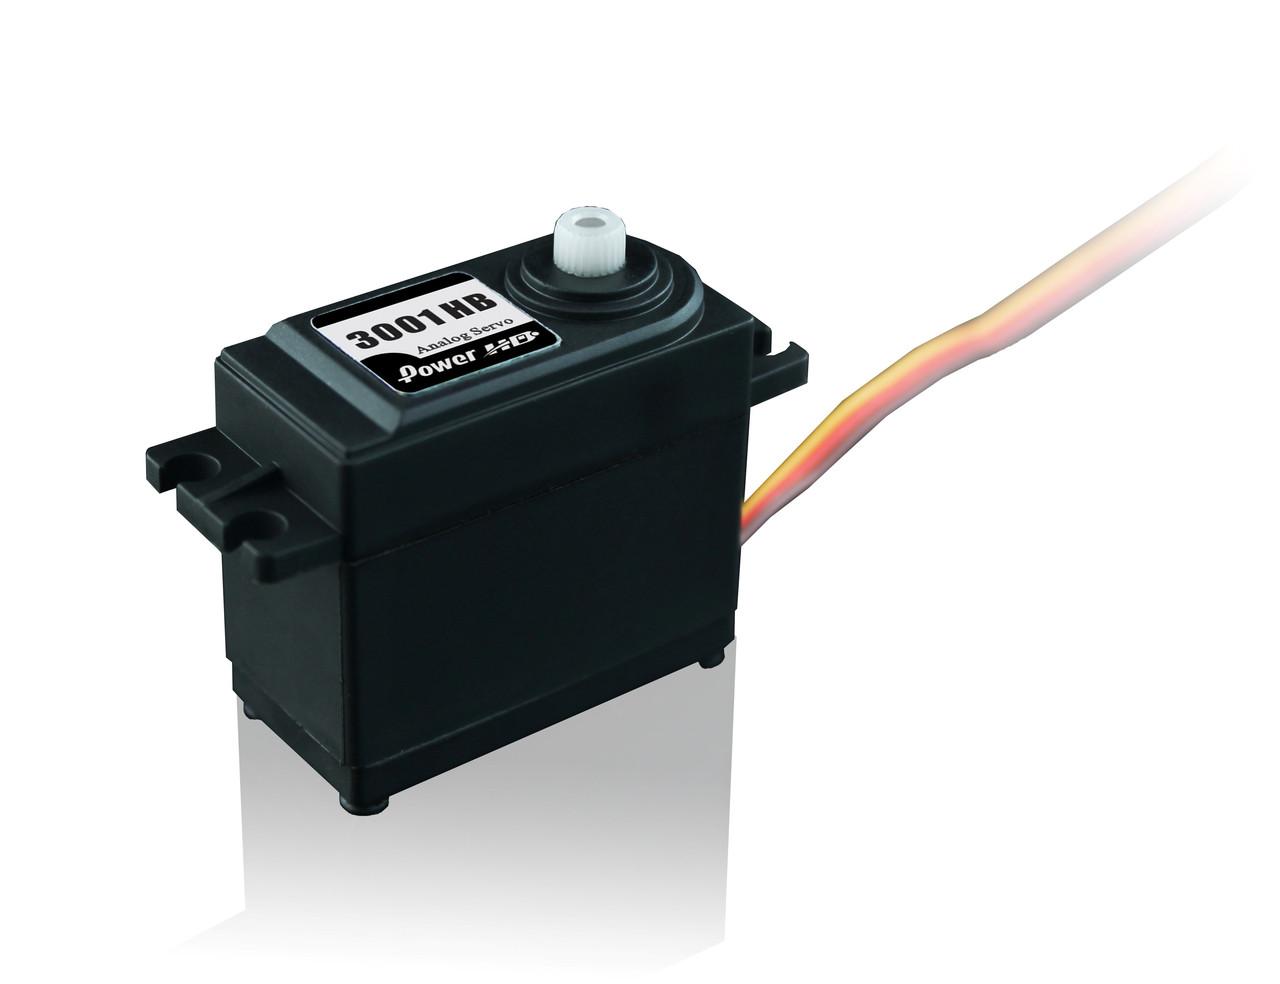 Сервопривід стандарт 43г Power HD 3001HB 3.5 кг/0.15 сек